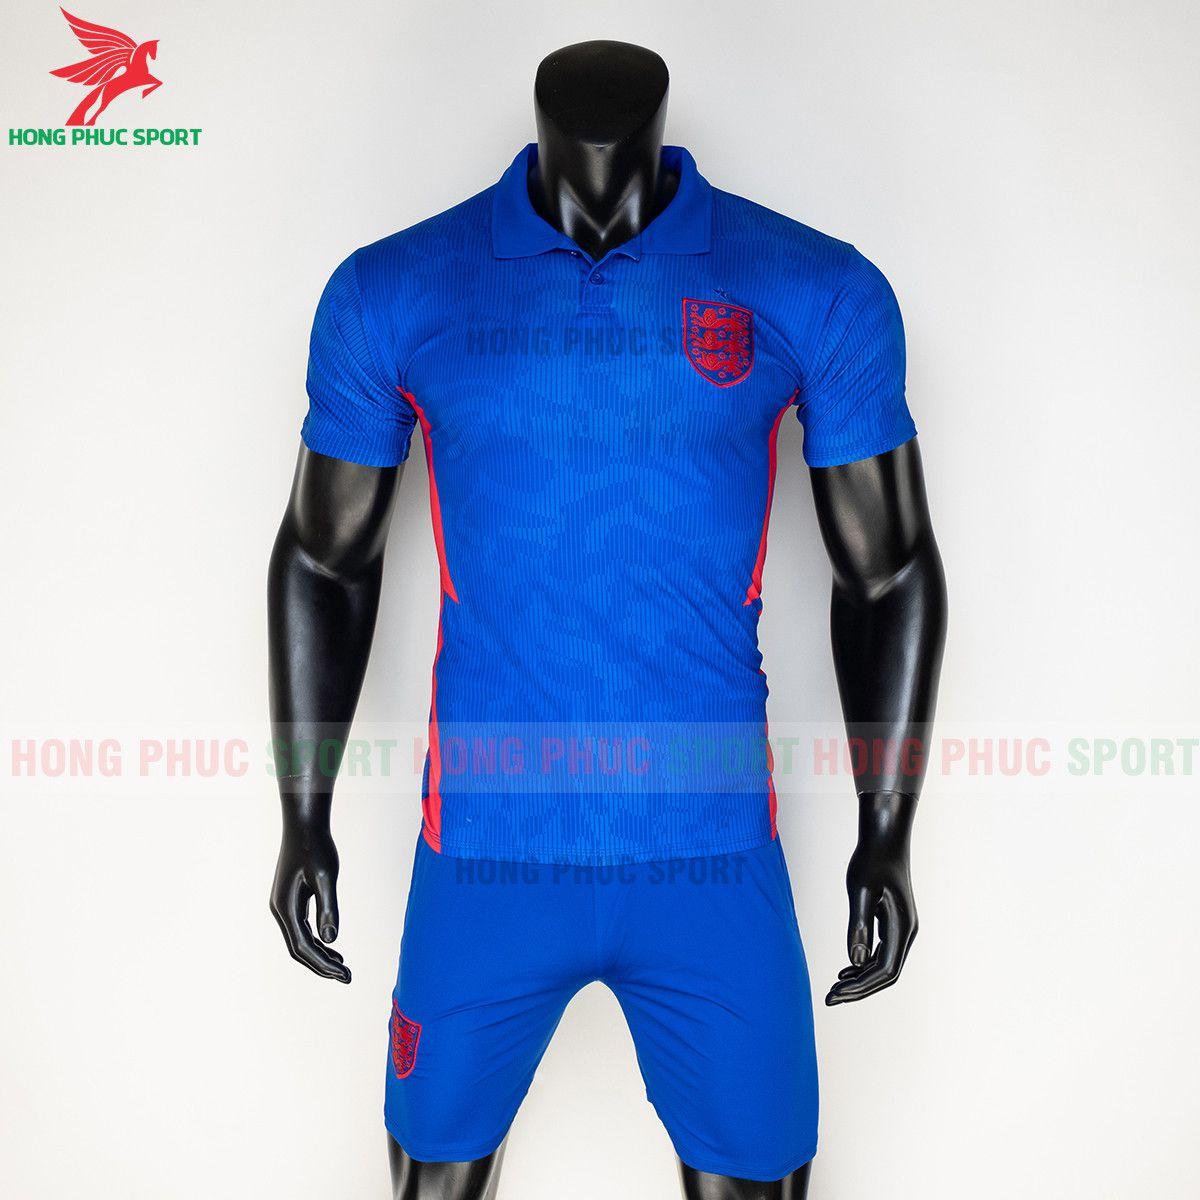 https://cdn.hongphucsport.com/unsafe/s4.shopbay.vn/files/285/ao-bong-da-tuyen-anh-euro-2021-san-khach-thun-lanh-6-61558aaa92c56.jpg